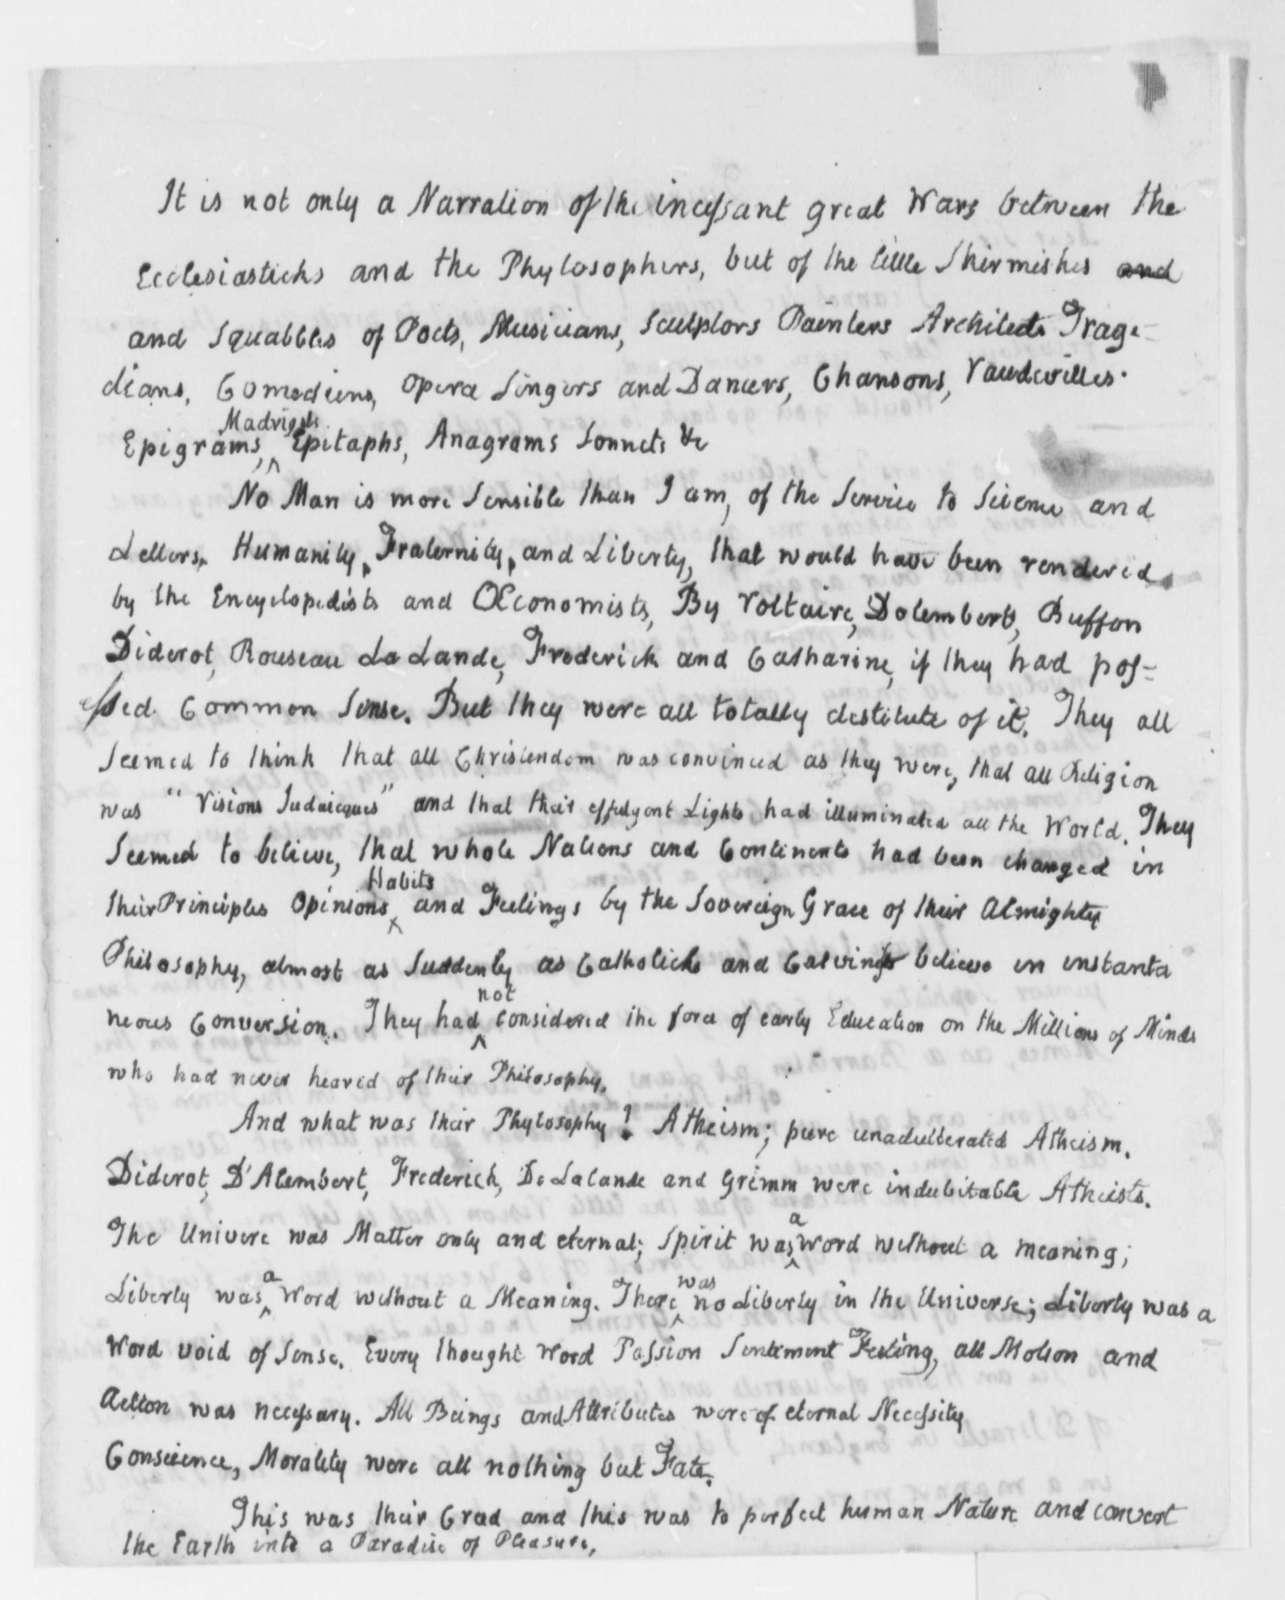 John Adams to Thomas Jefferson, March 2, 1816